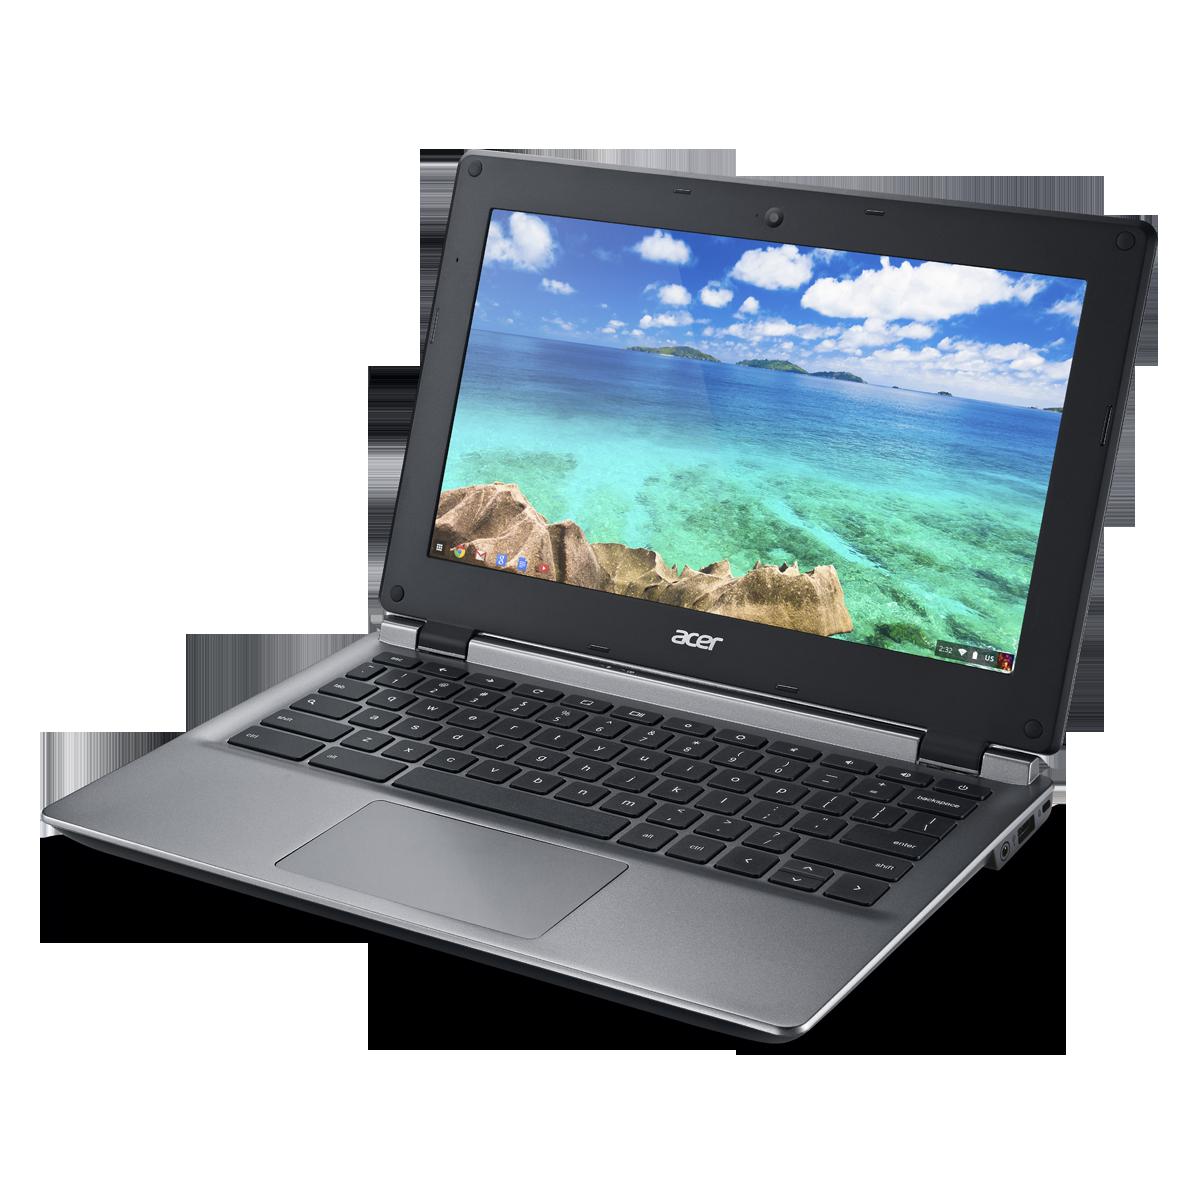 "Alapmk Protective Case Professional design For 11.6"" Acer Chromebook C771T C771 C731T"